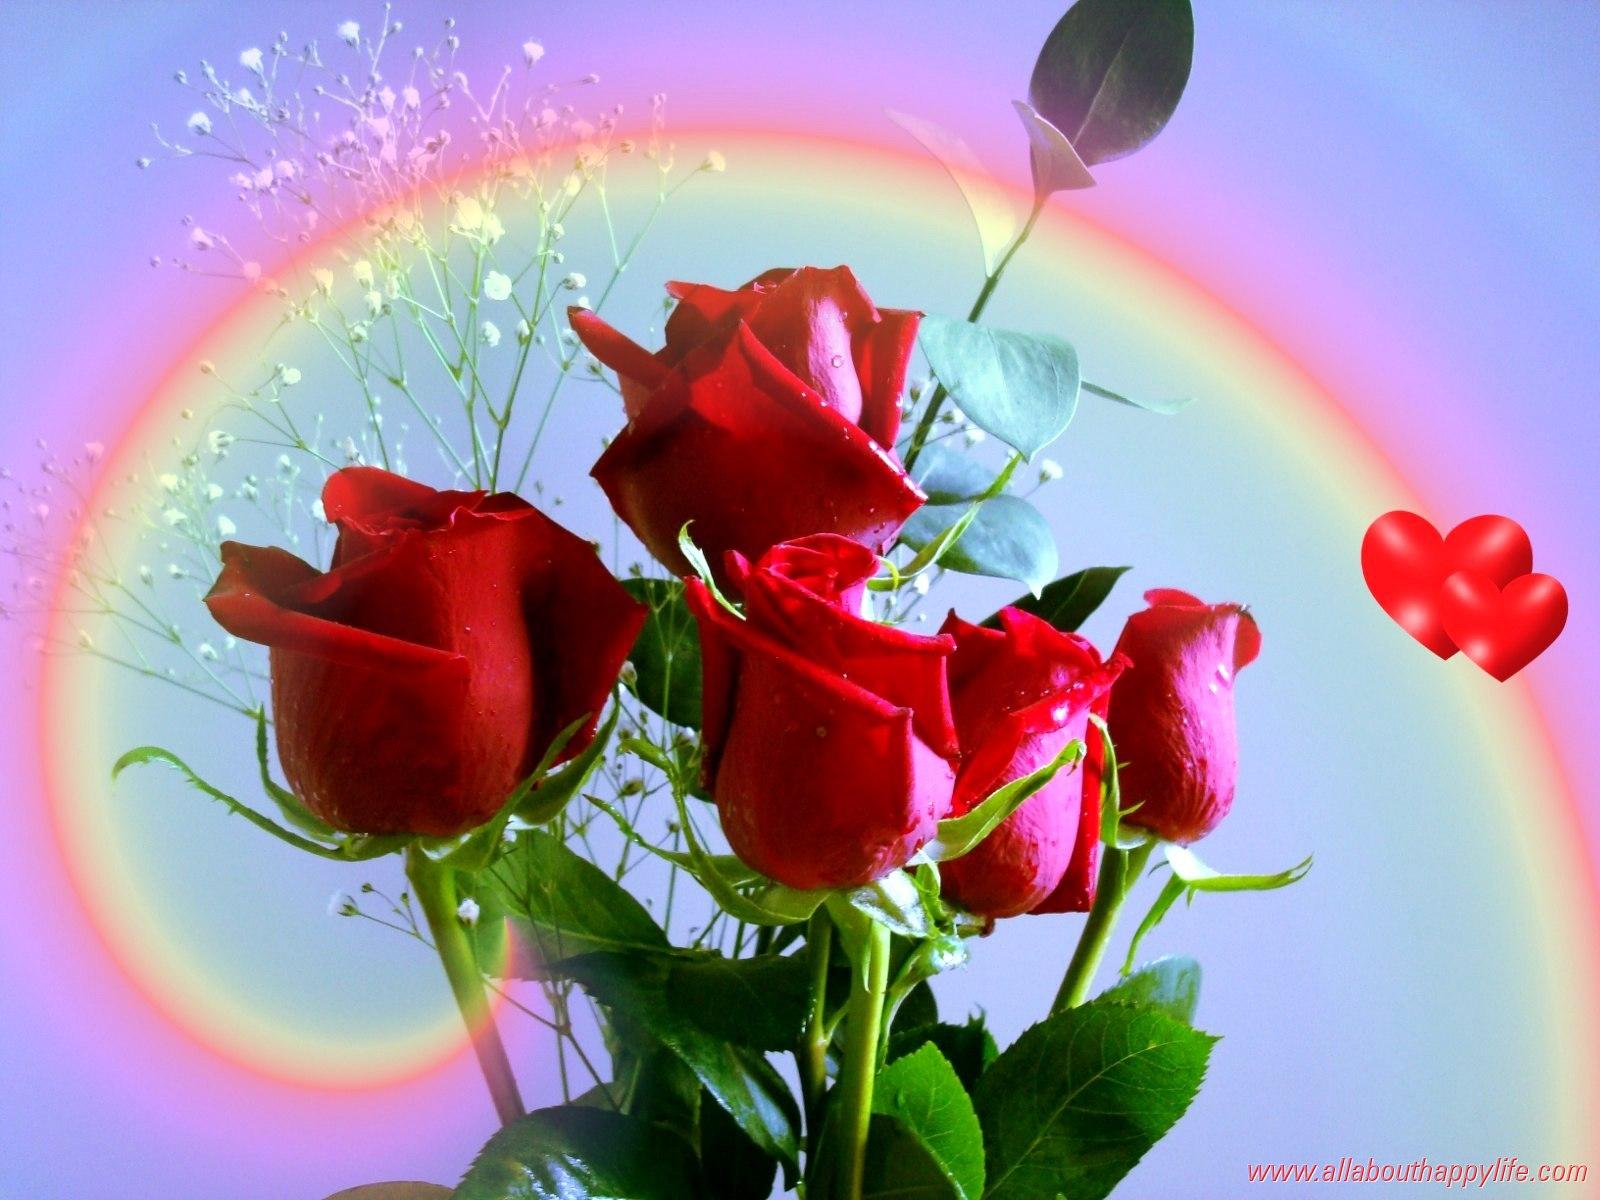 rose red love wallpaper